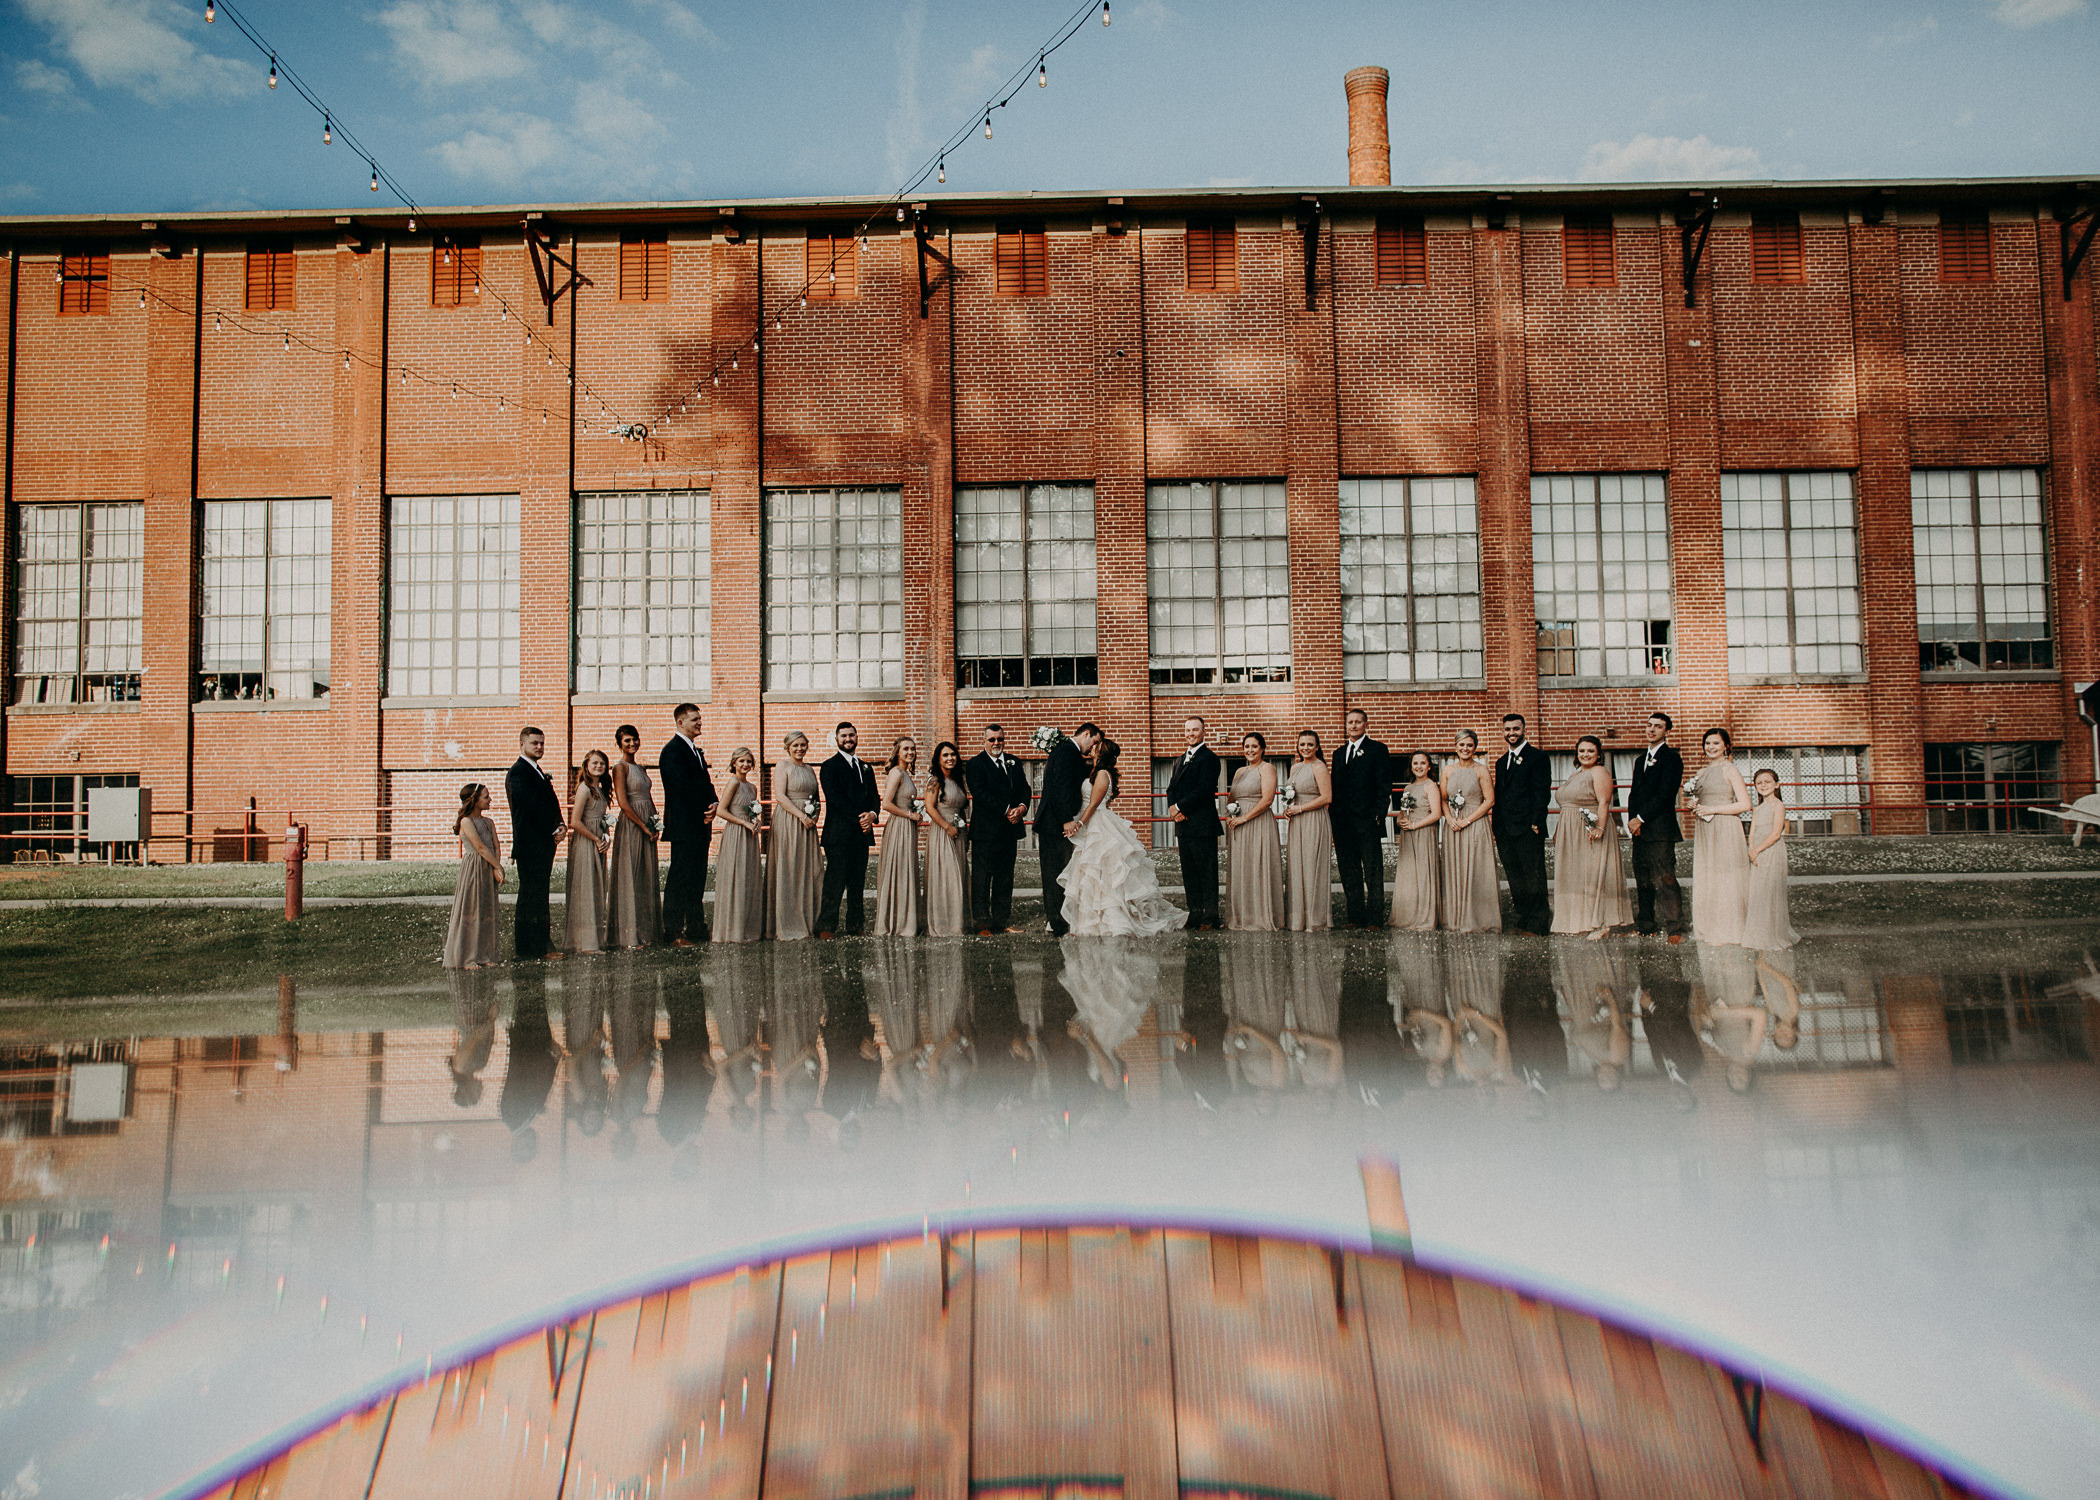 49 4 - Atlanta Wedding Photographer - The engine room - Ga - Wedding trends - Aline Marin Photography.jpg